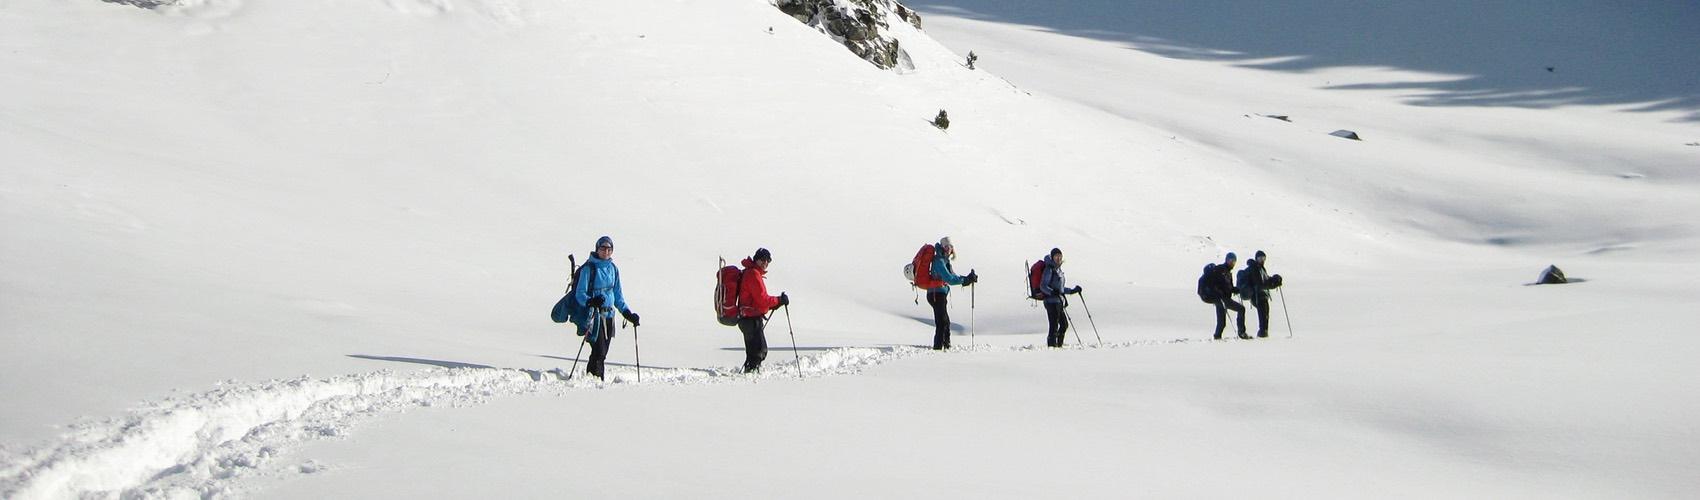 banner-raquetas-nieve